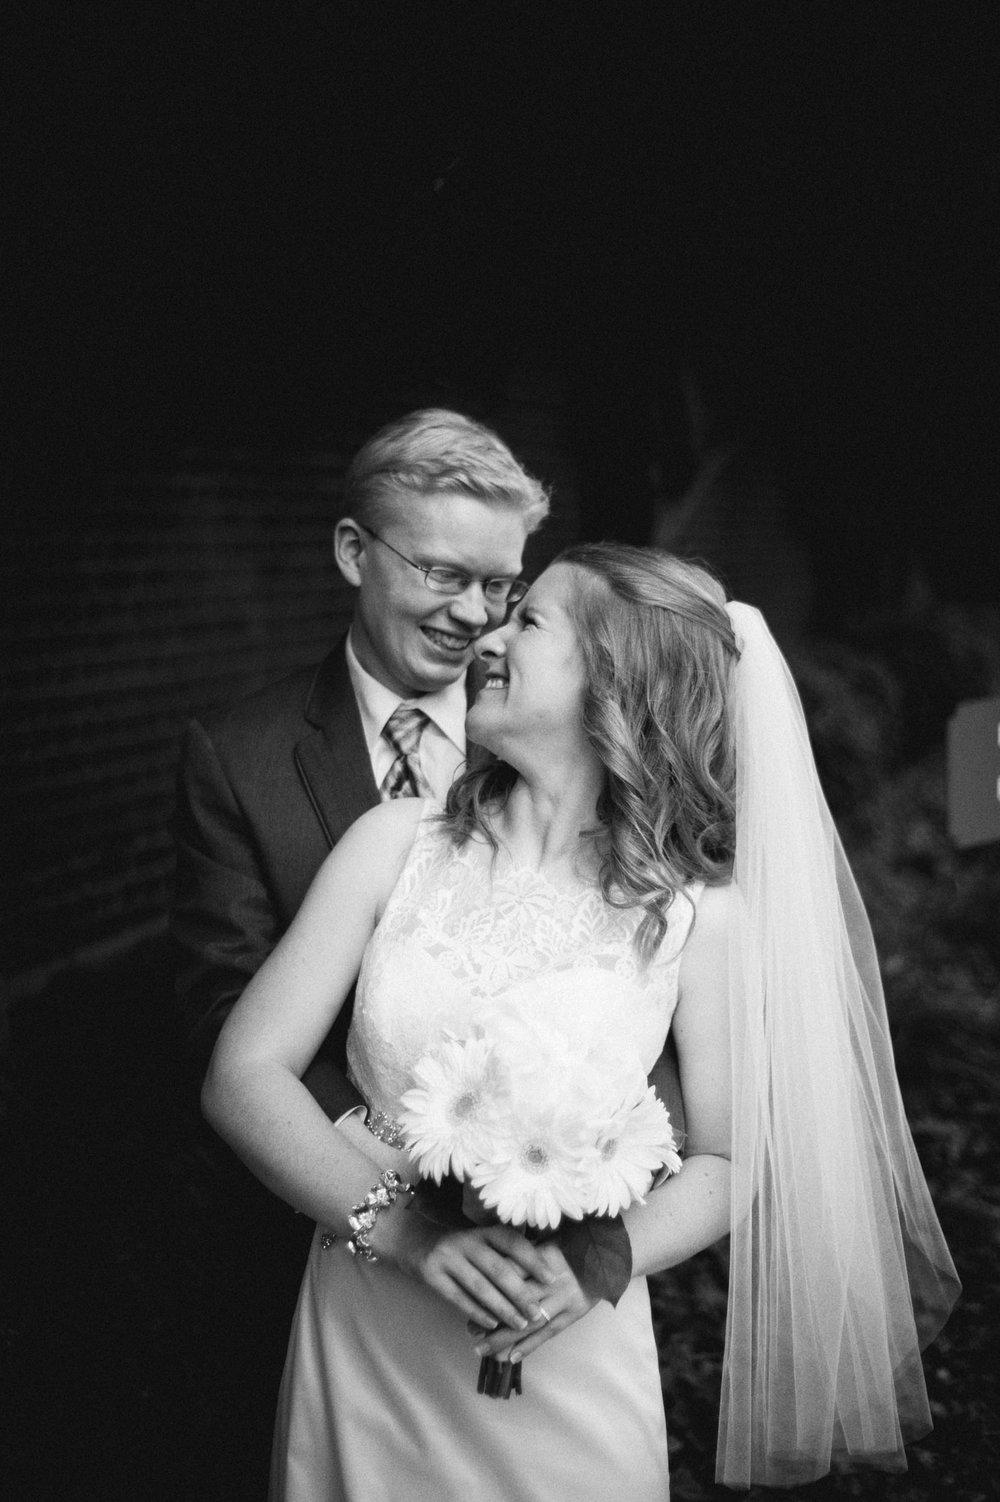 Jenna-Patrick-Garden-Court-Presbyterian-Seminary-Wedding-Louisville-Kentucky-Sarah-Katherine-Davis-Photography-51.jpg